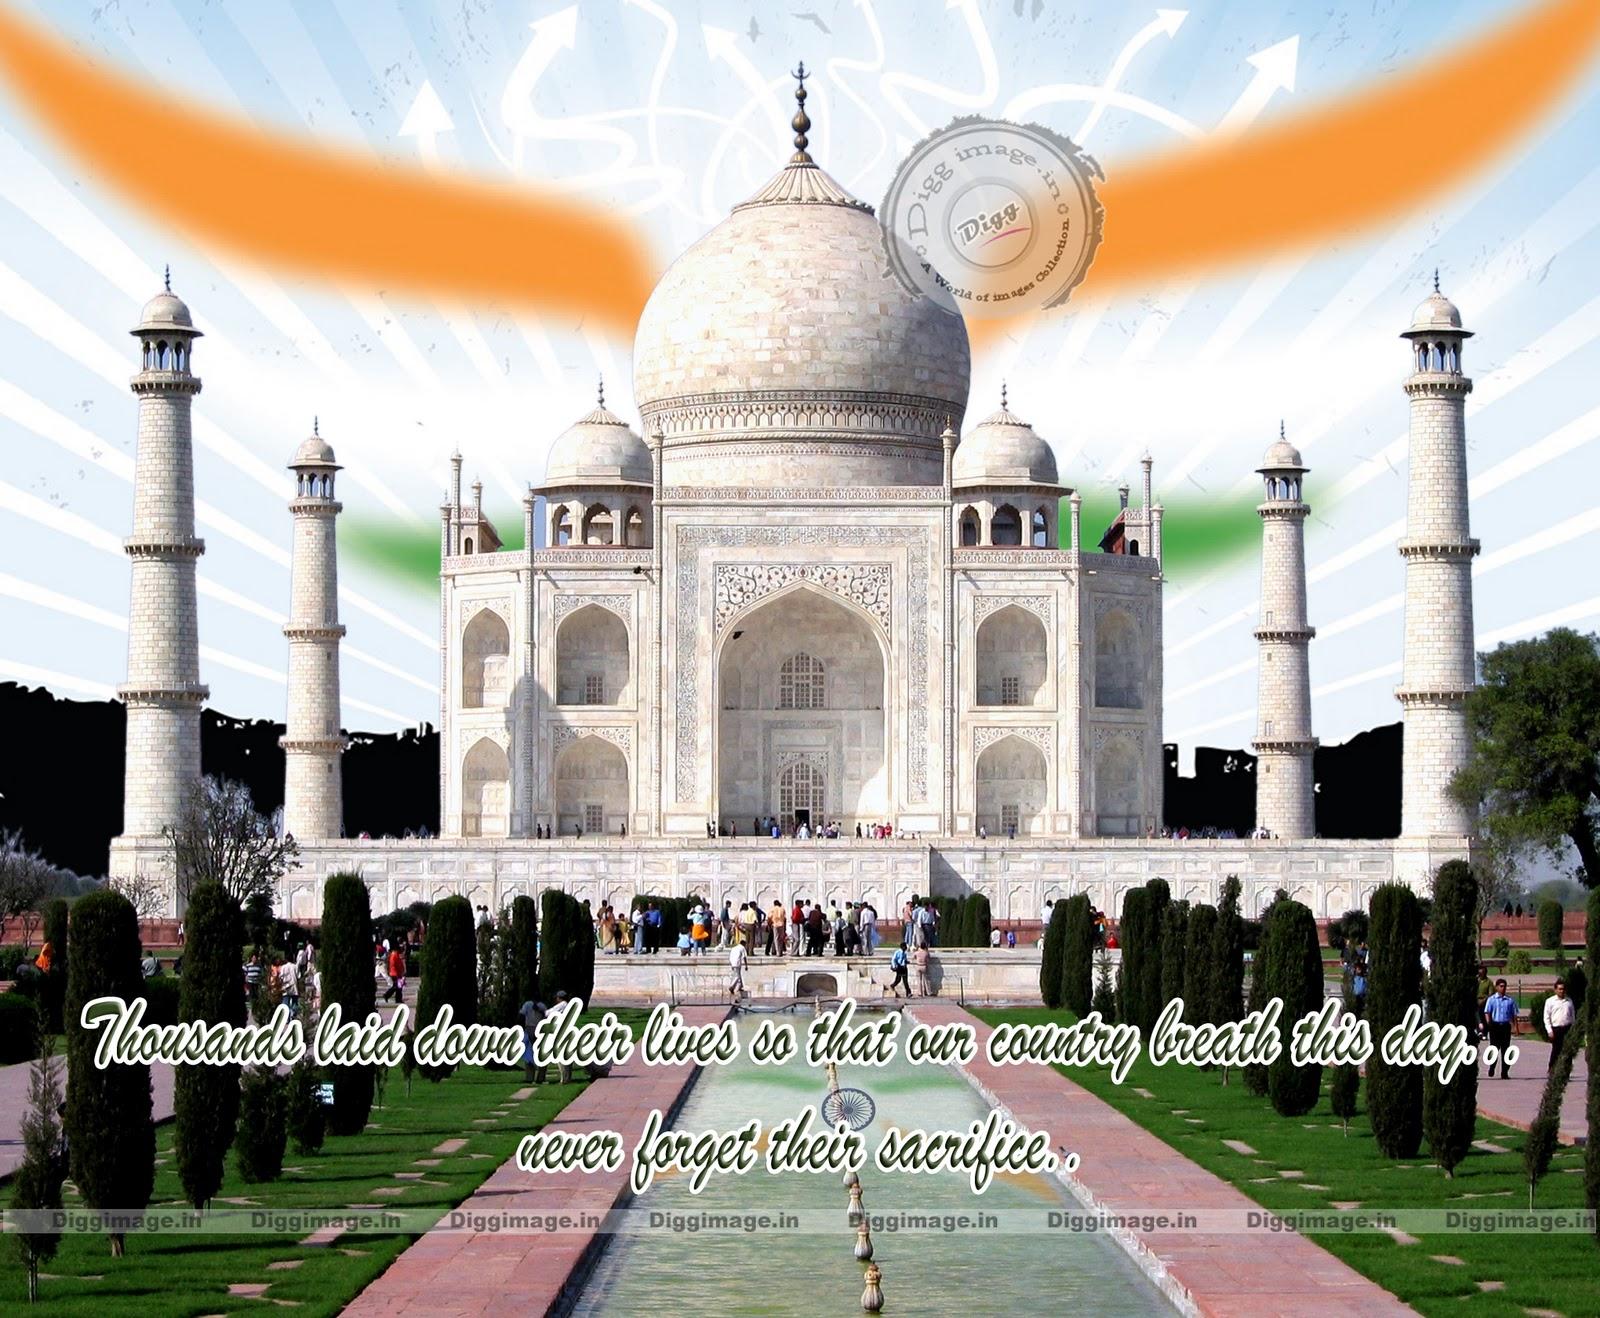 3bpblogspot EVlQxIsM5t0 TT5pldBK1II Republic Day Of India Pc Wallpapers